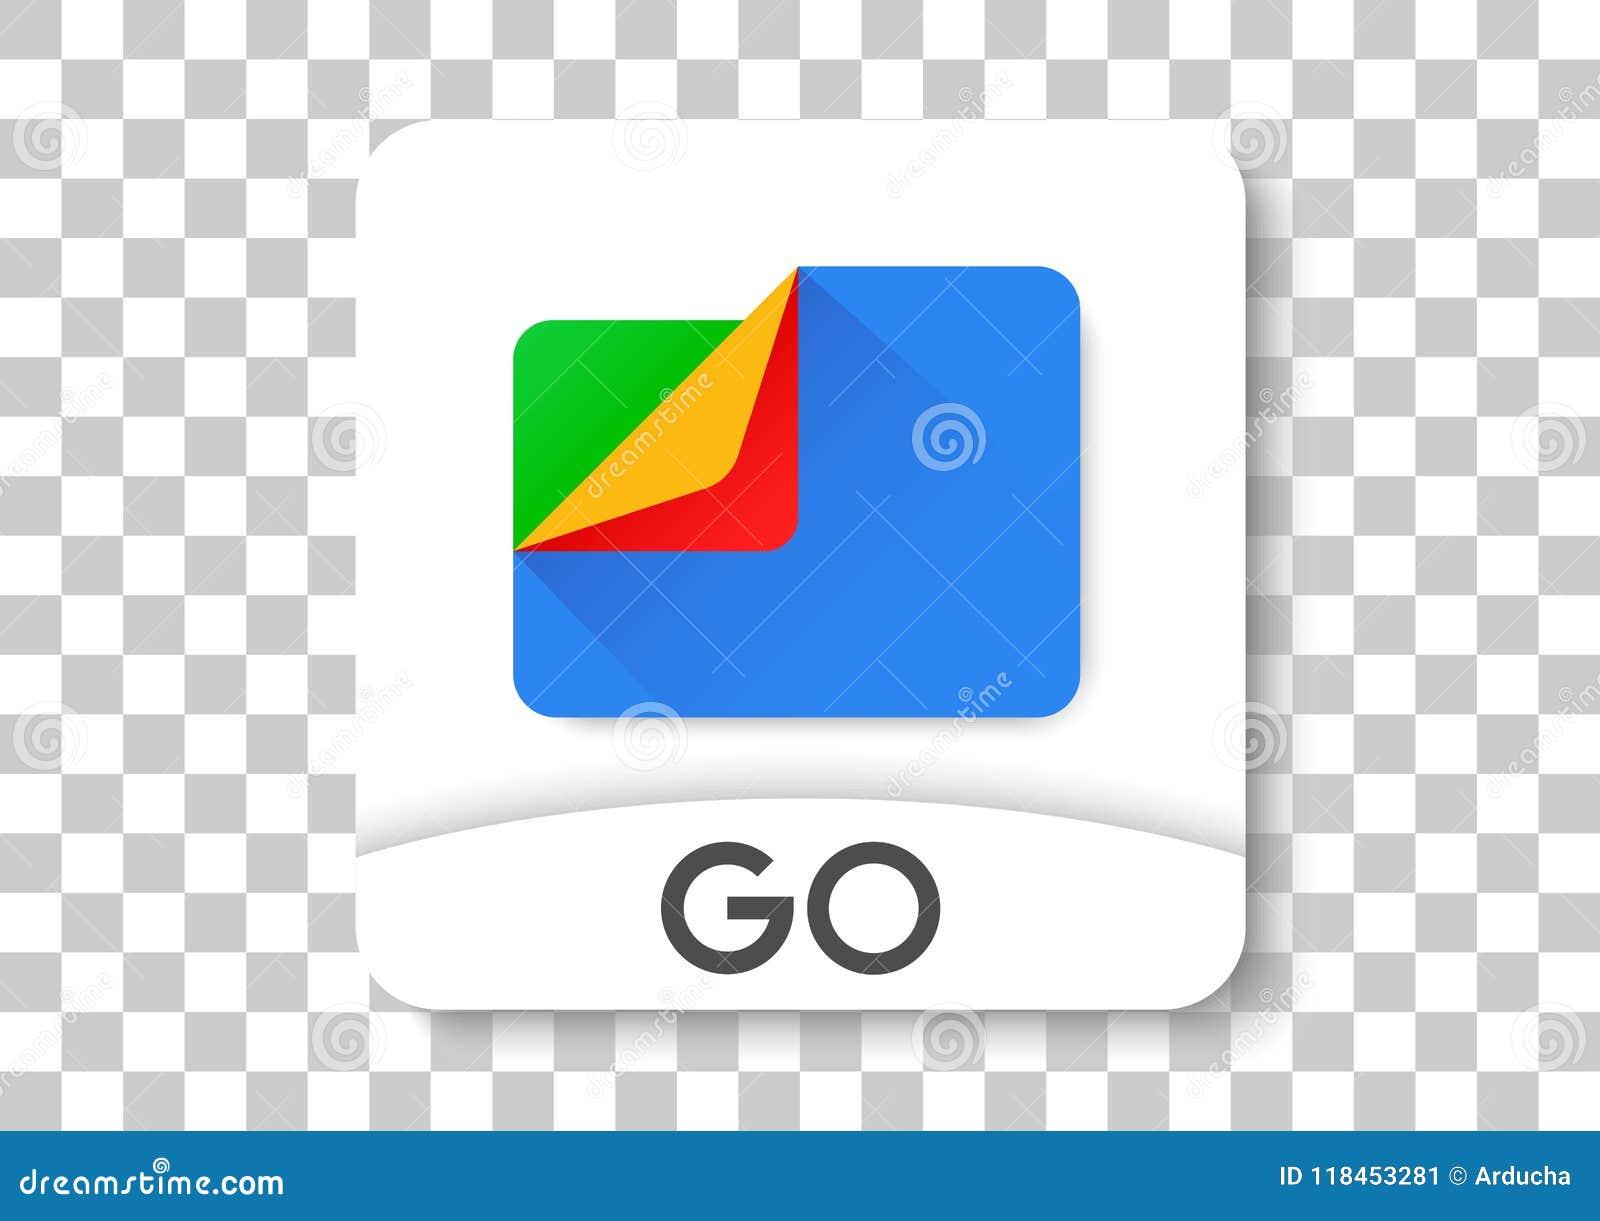 Google files go apk icon editorial photo  Illustration of